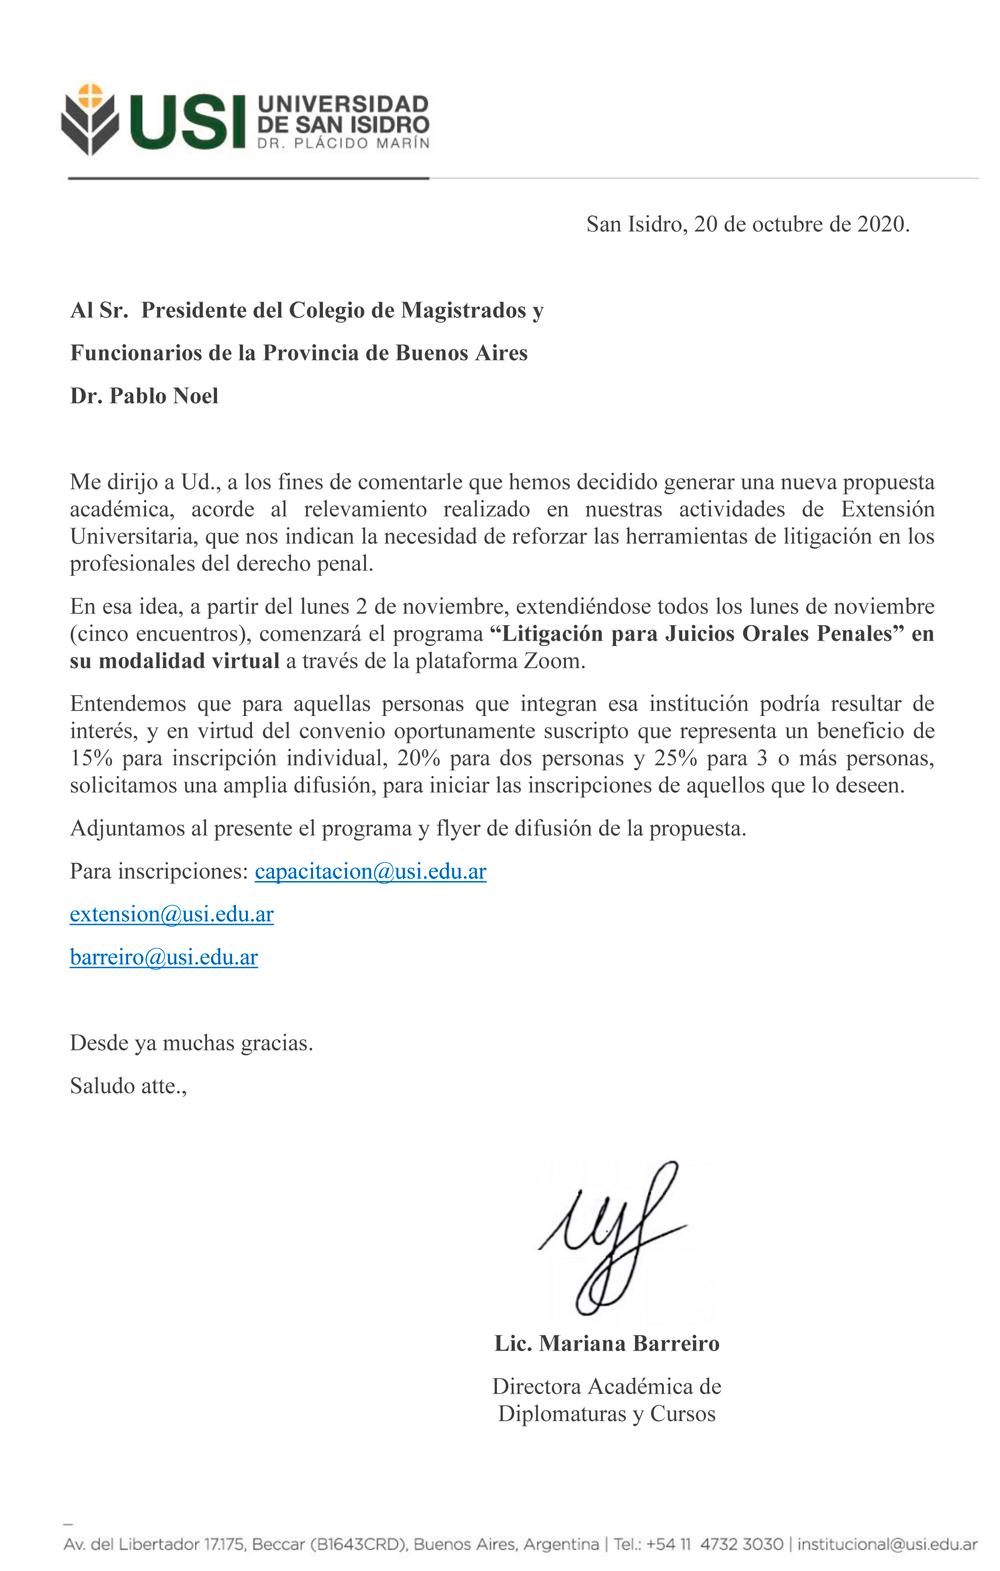 USI - UNIVERSIDAD DE SAN ISIDRO